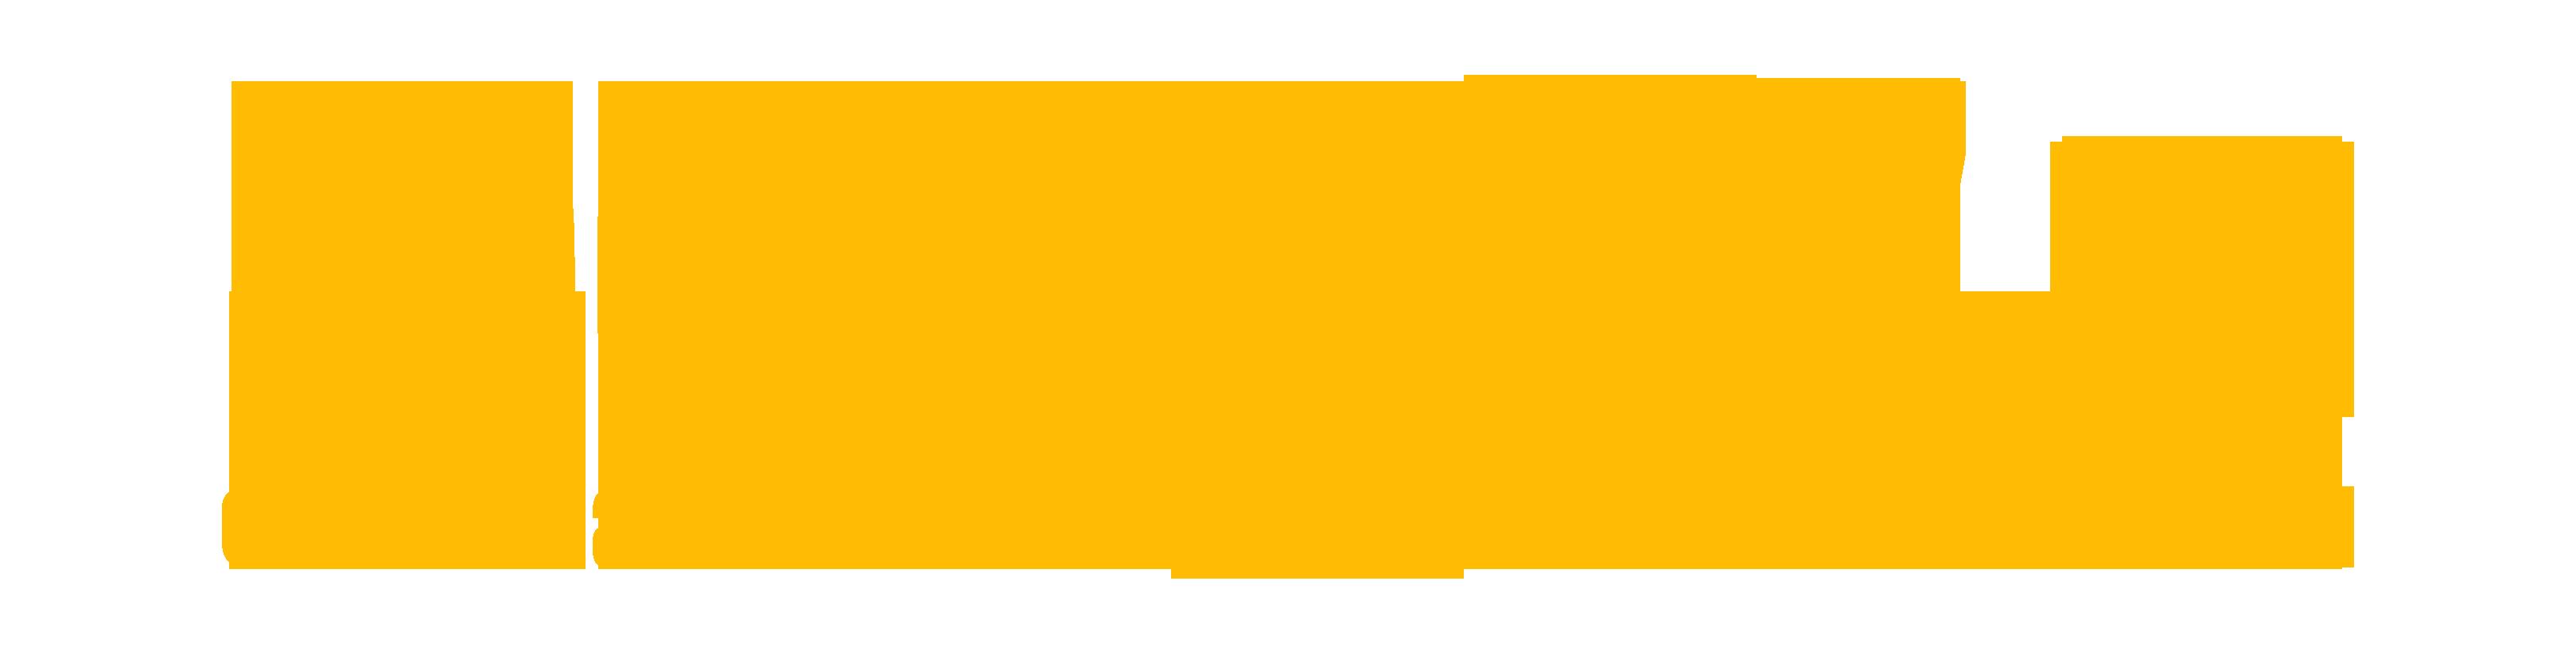 Спортивное питание в Иваново — Kachalka37.ru